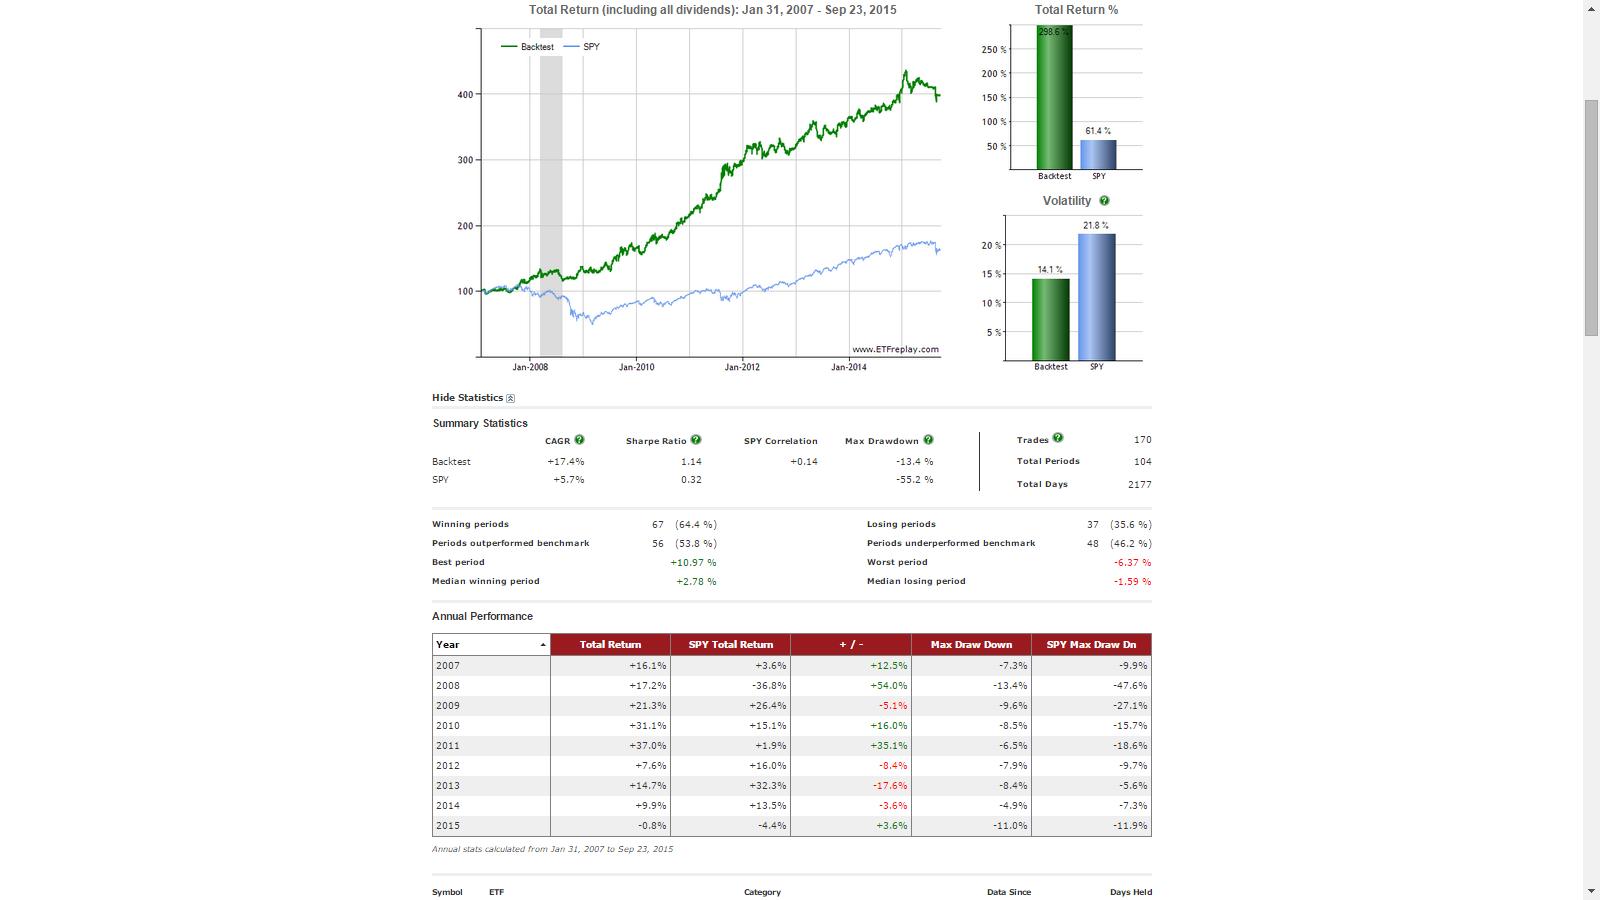 Asset Selector 09-24-15